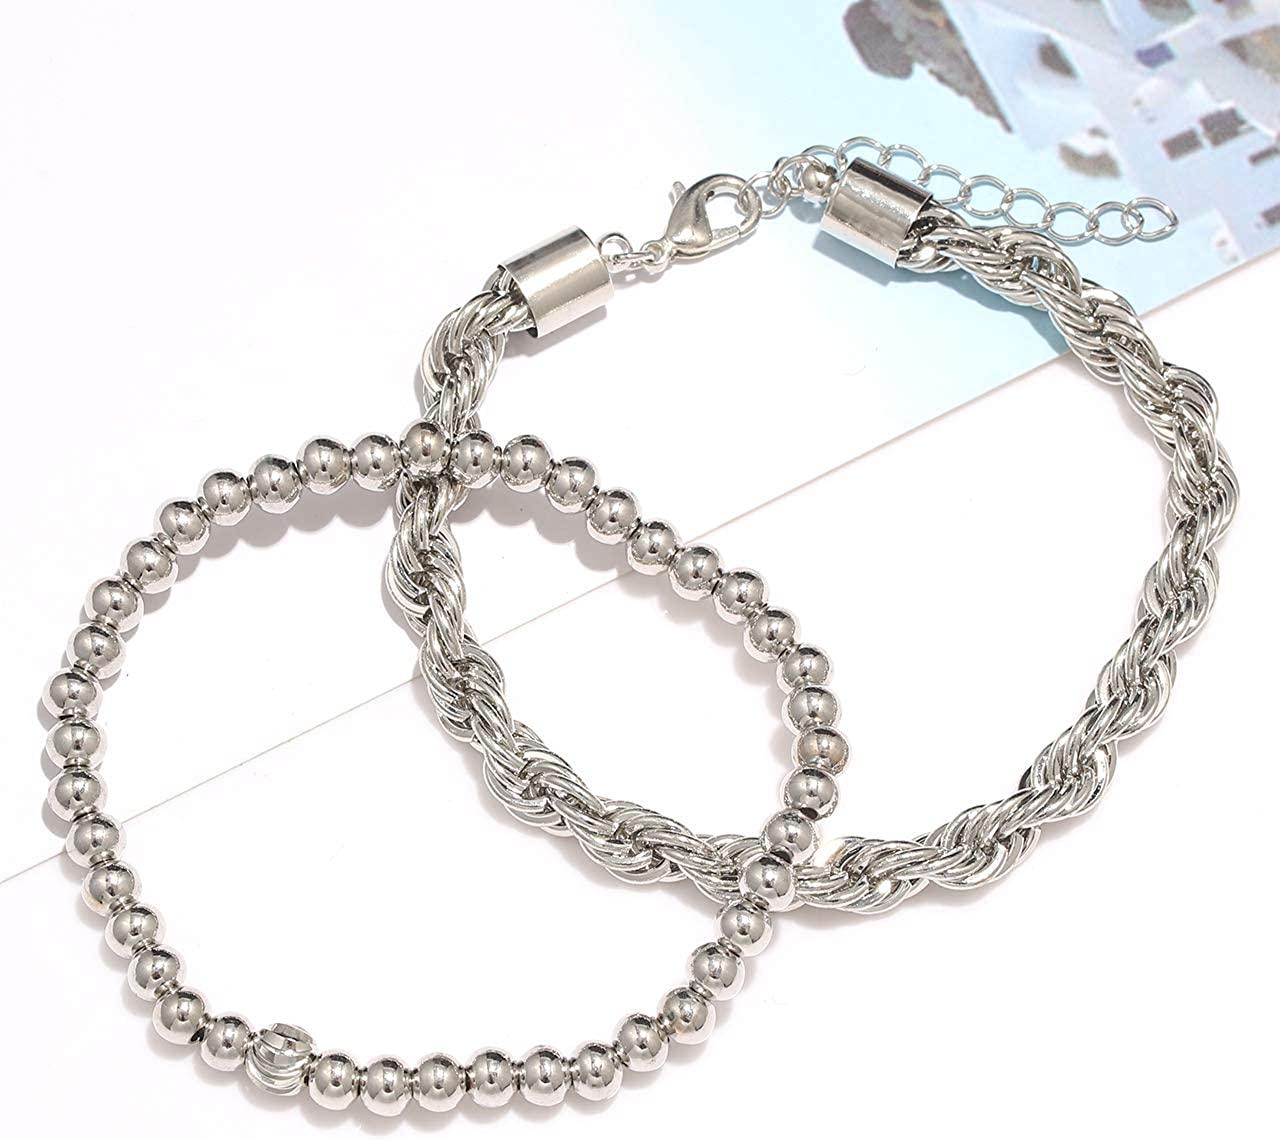 Chunky Link Chain Bracelets for Women Girls Stackable Brass Bead Stretch Bracelet Dainty Open Cuff Bracelets Layered Bracelet Bangles Set Birthday Party Gift